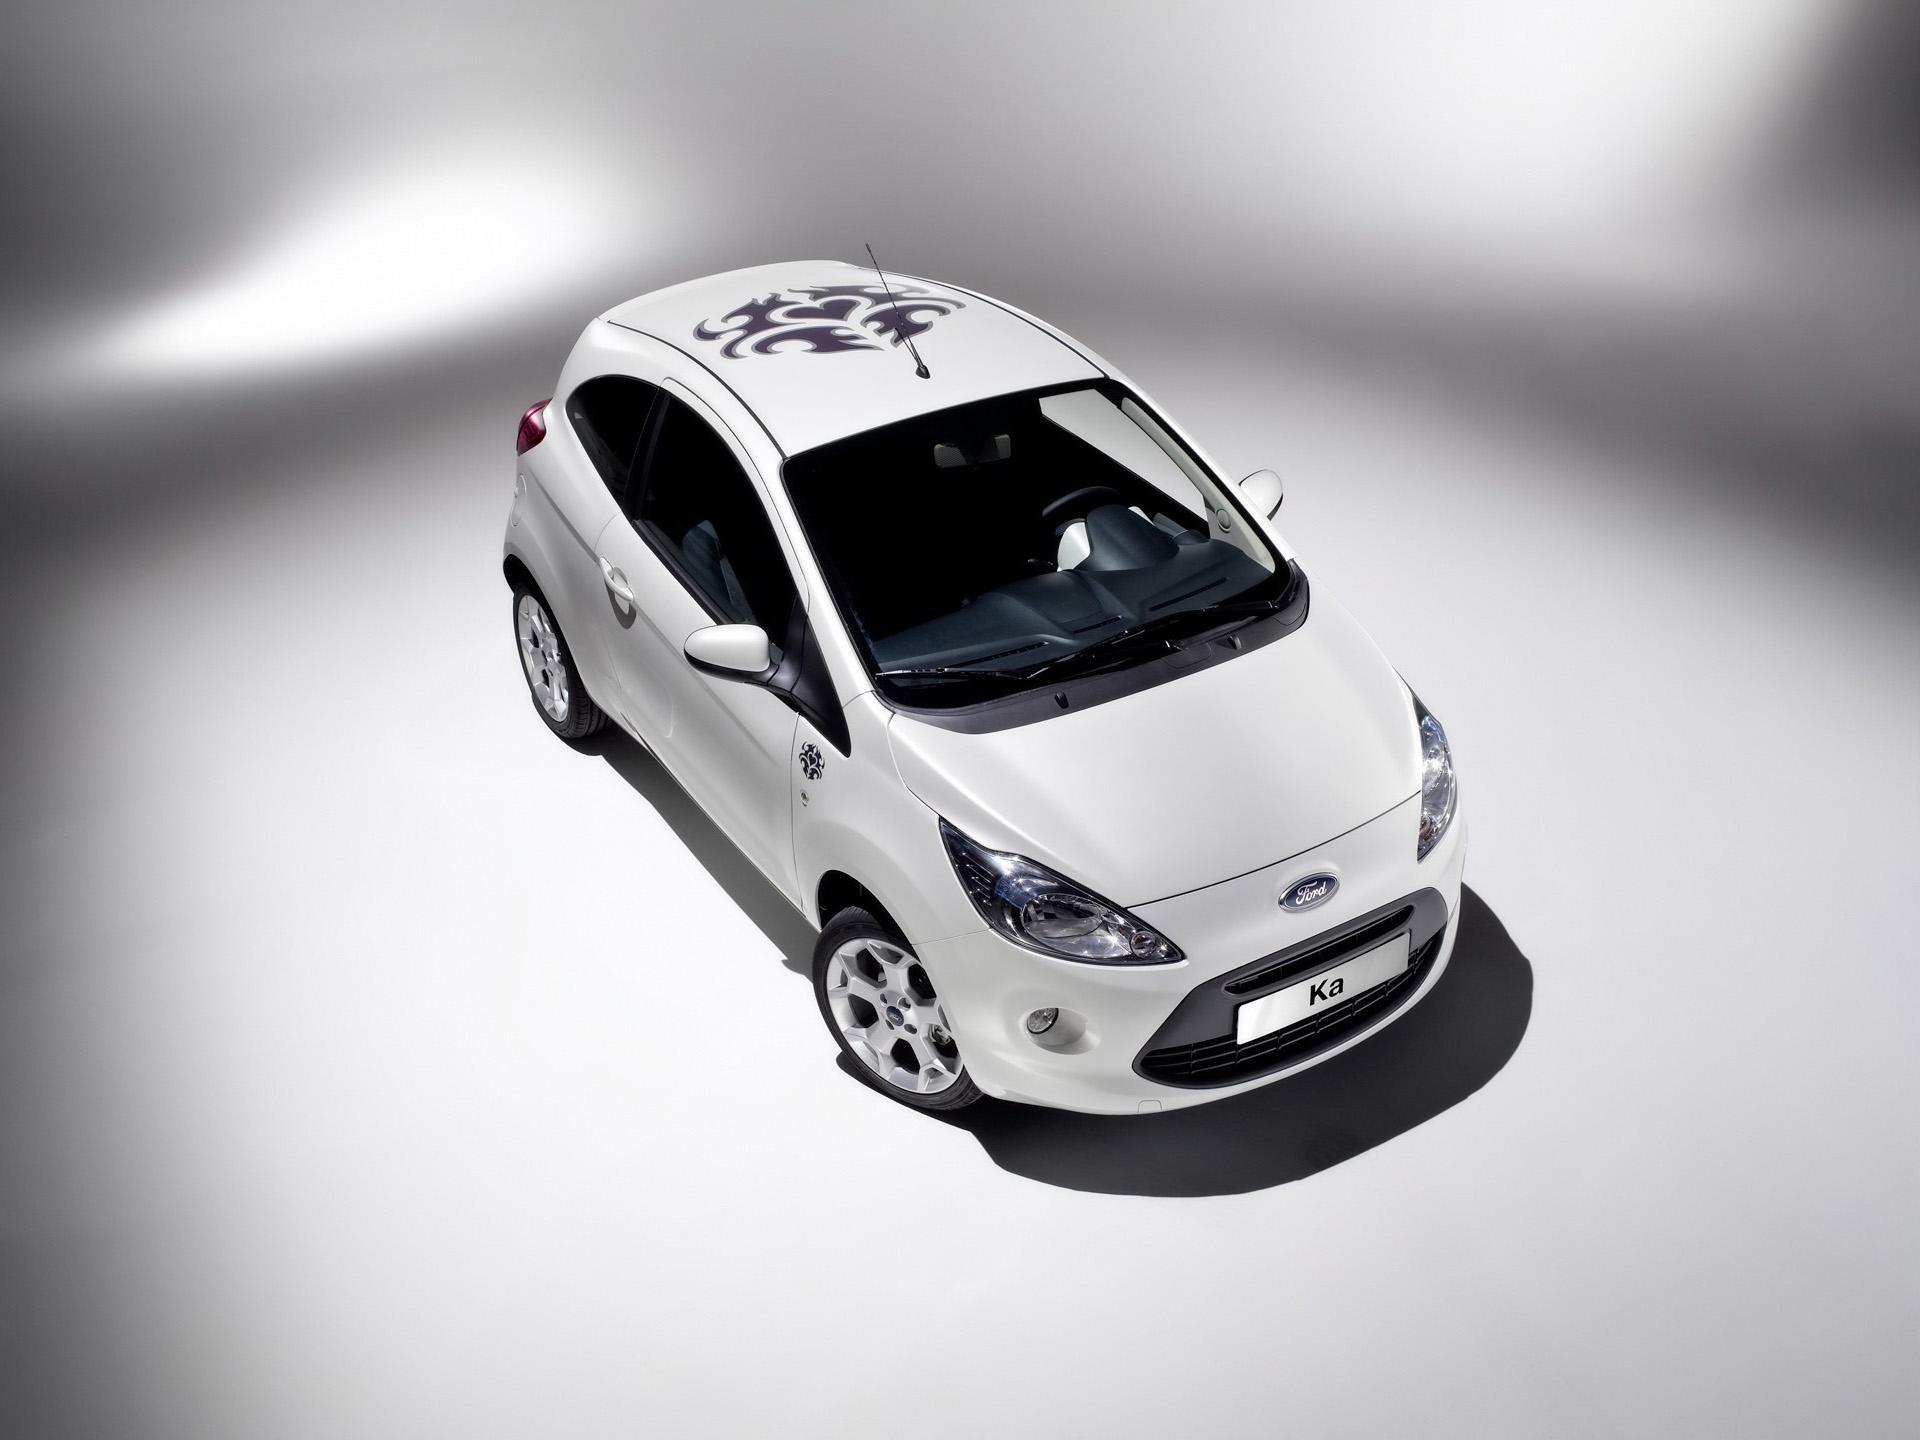 2009 Ford Ka Tattoo News and Information | conceptcarz.com